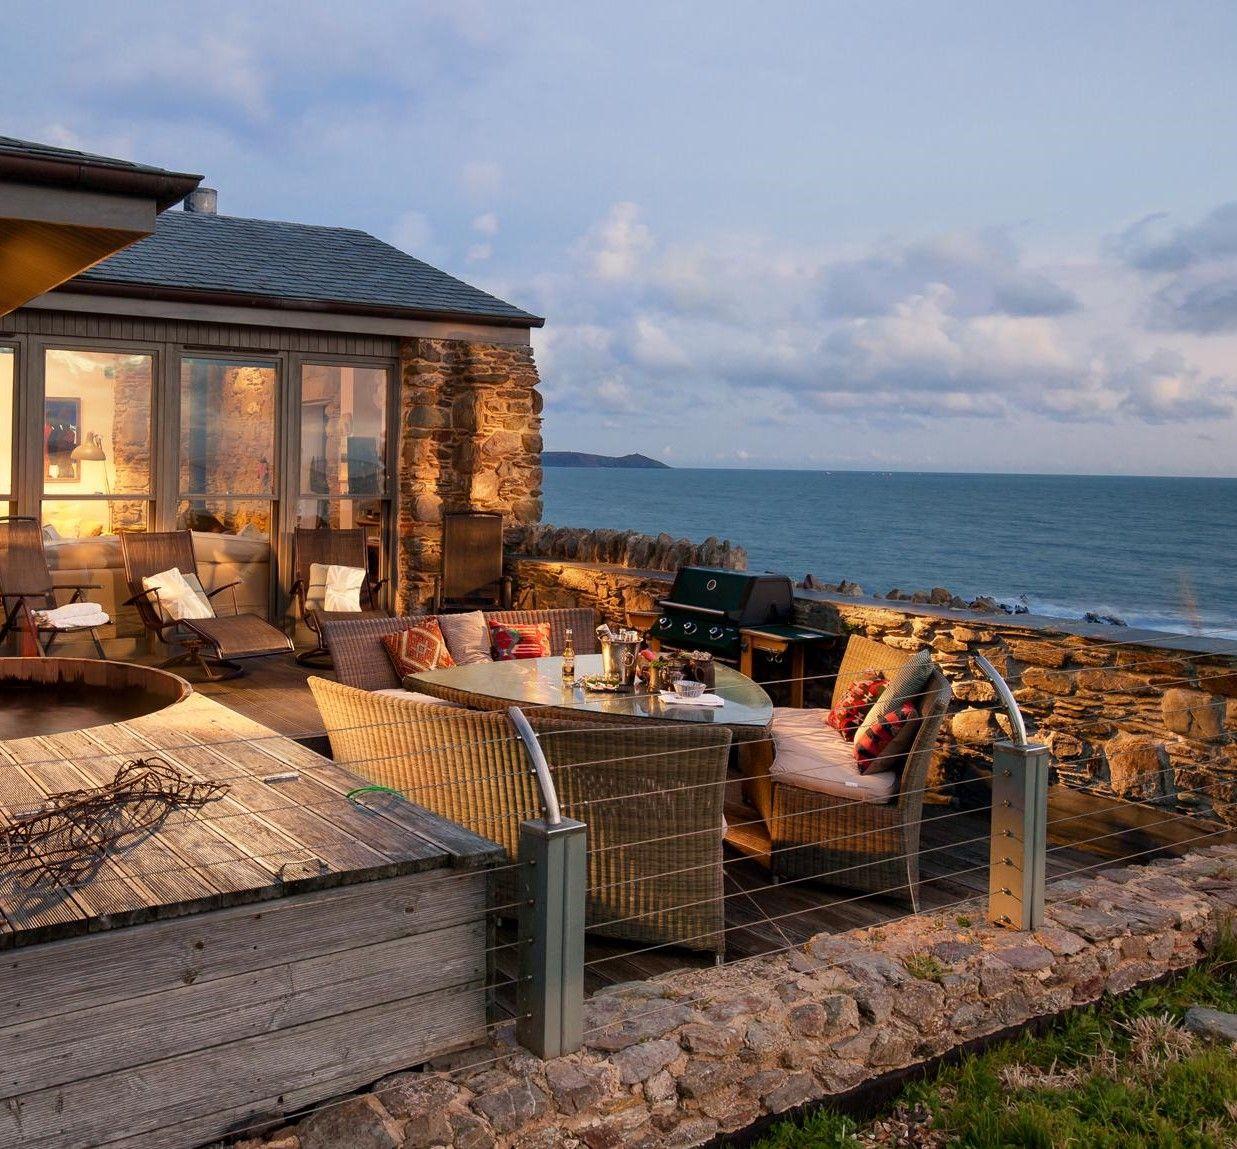 Pin By Carla Steele On Beach Home Inspiration Luxury Beach House Log Cabin Holidays Hot Tub Holidays